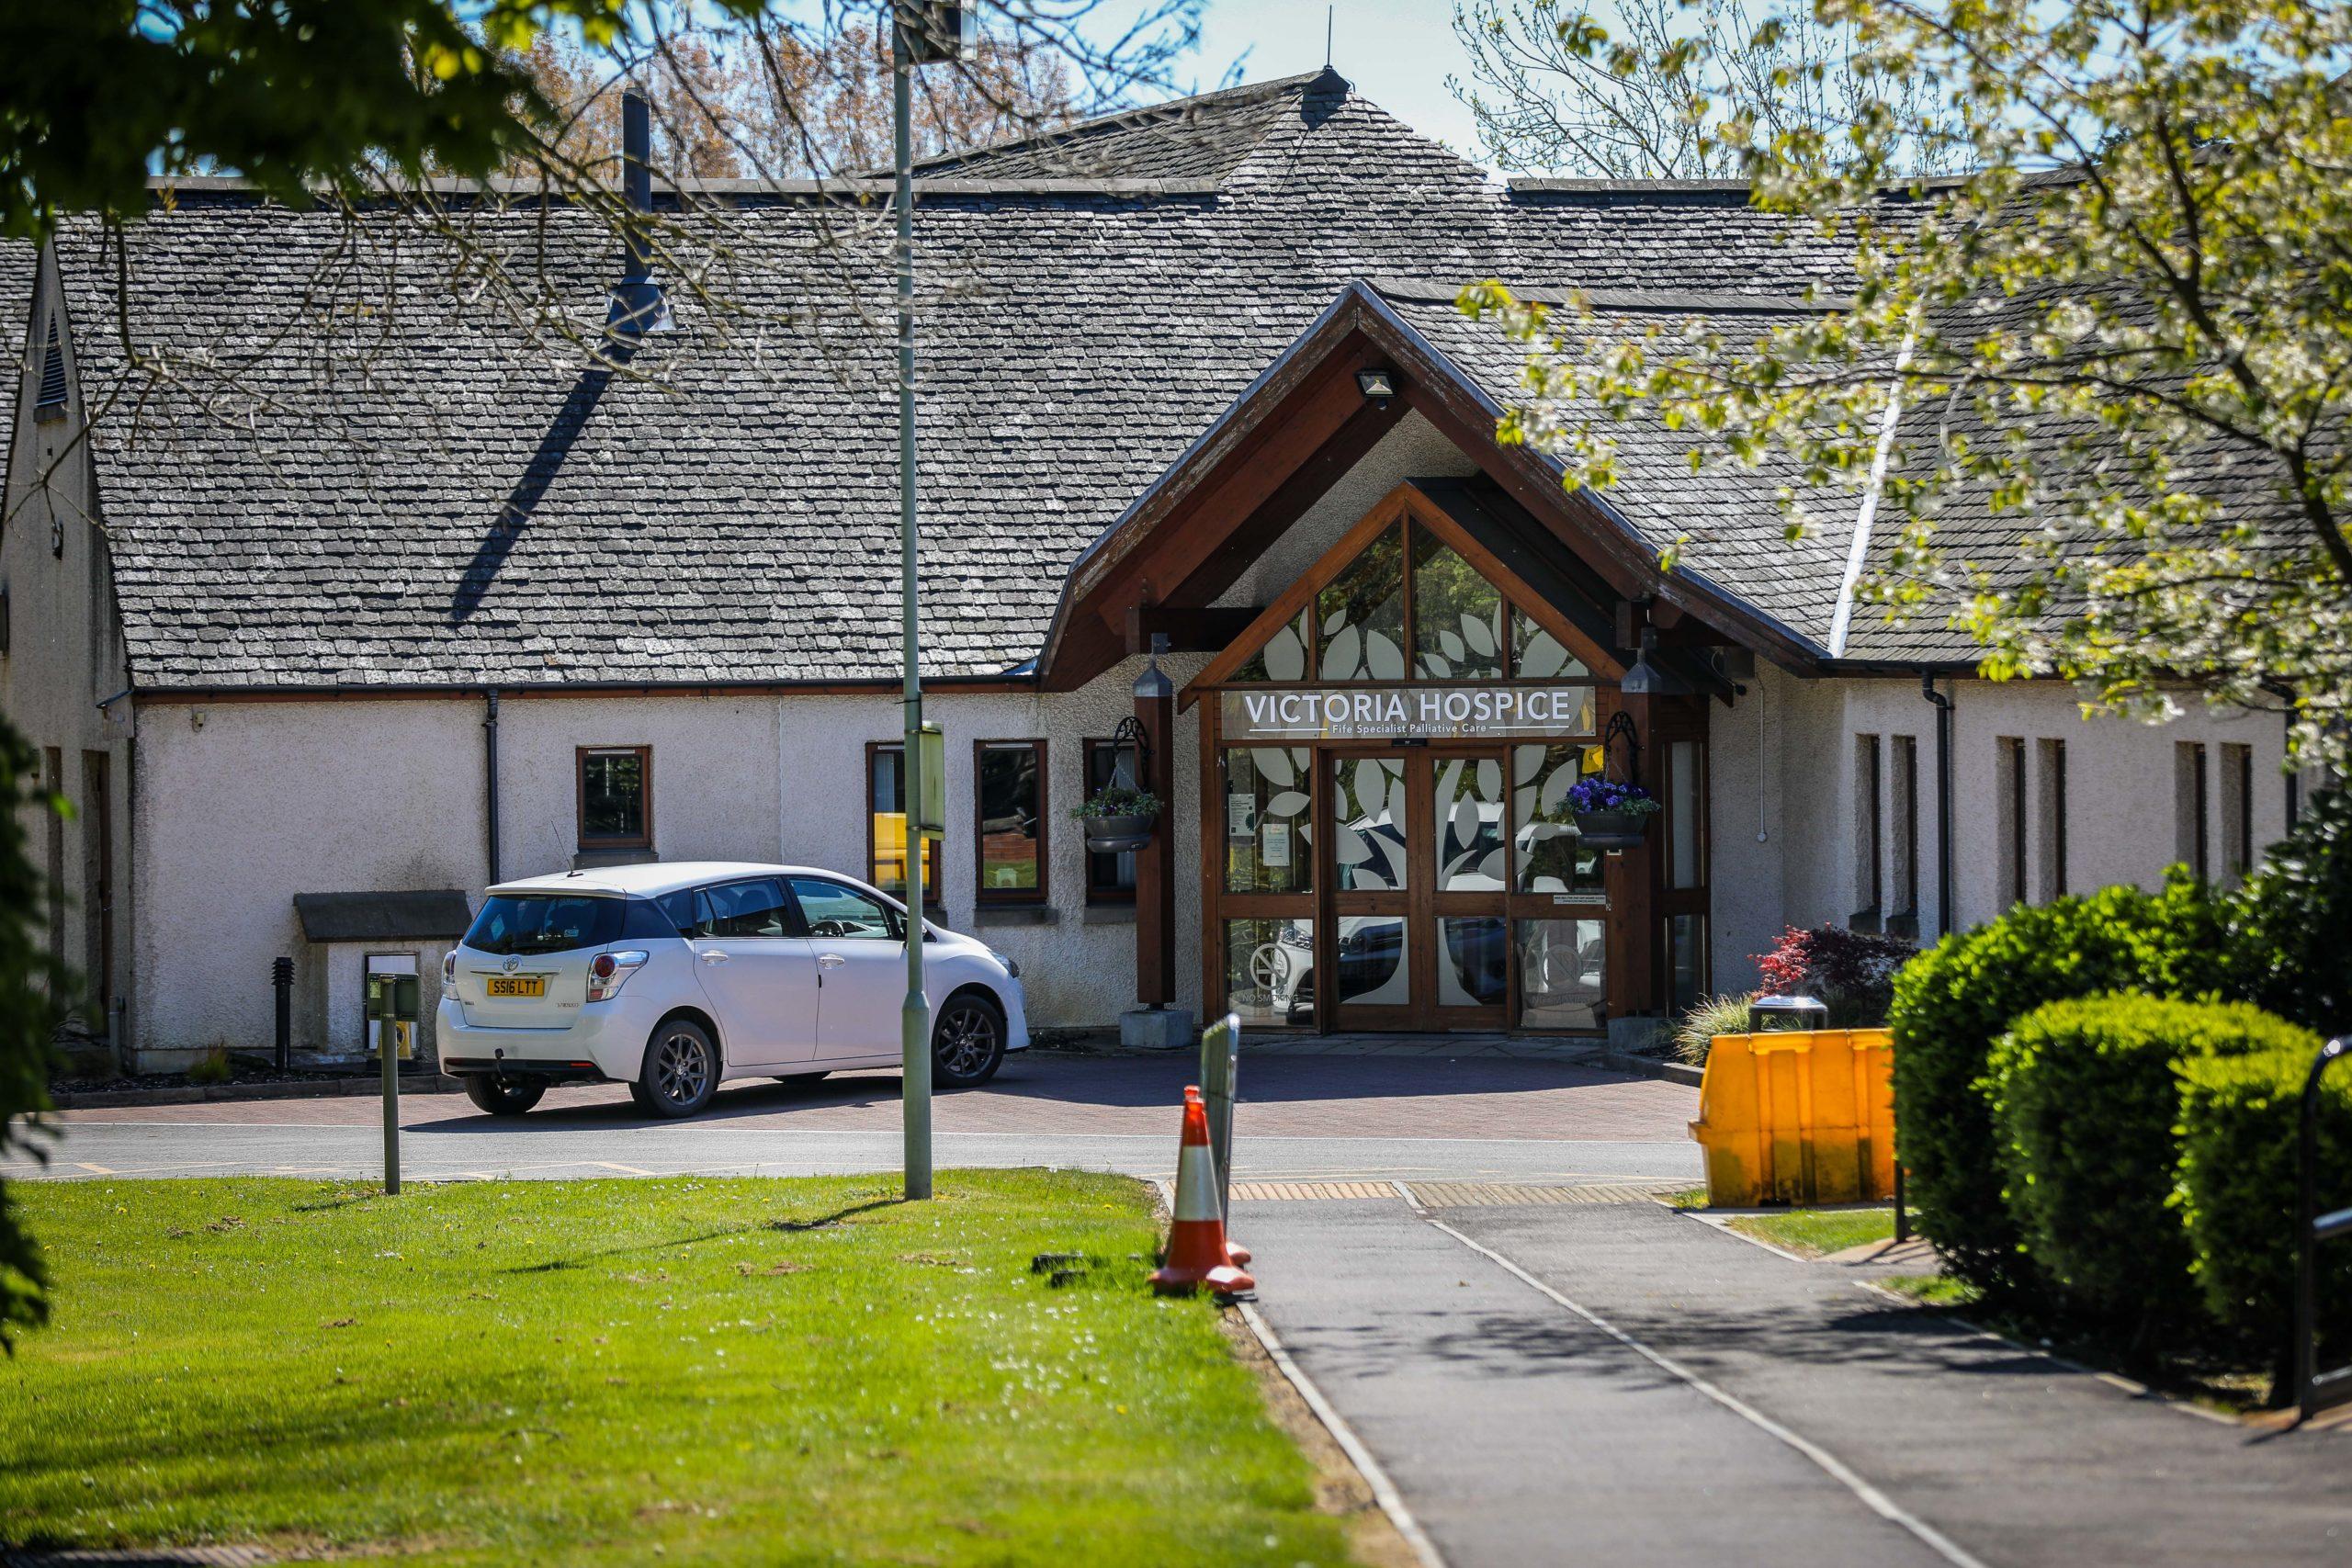 Victoria Hospice, Kirkcaldy.